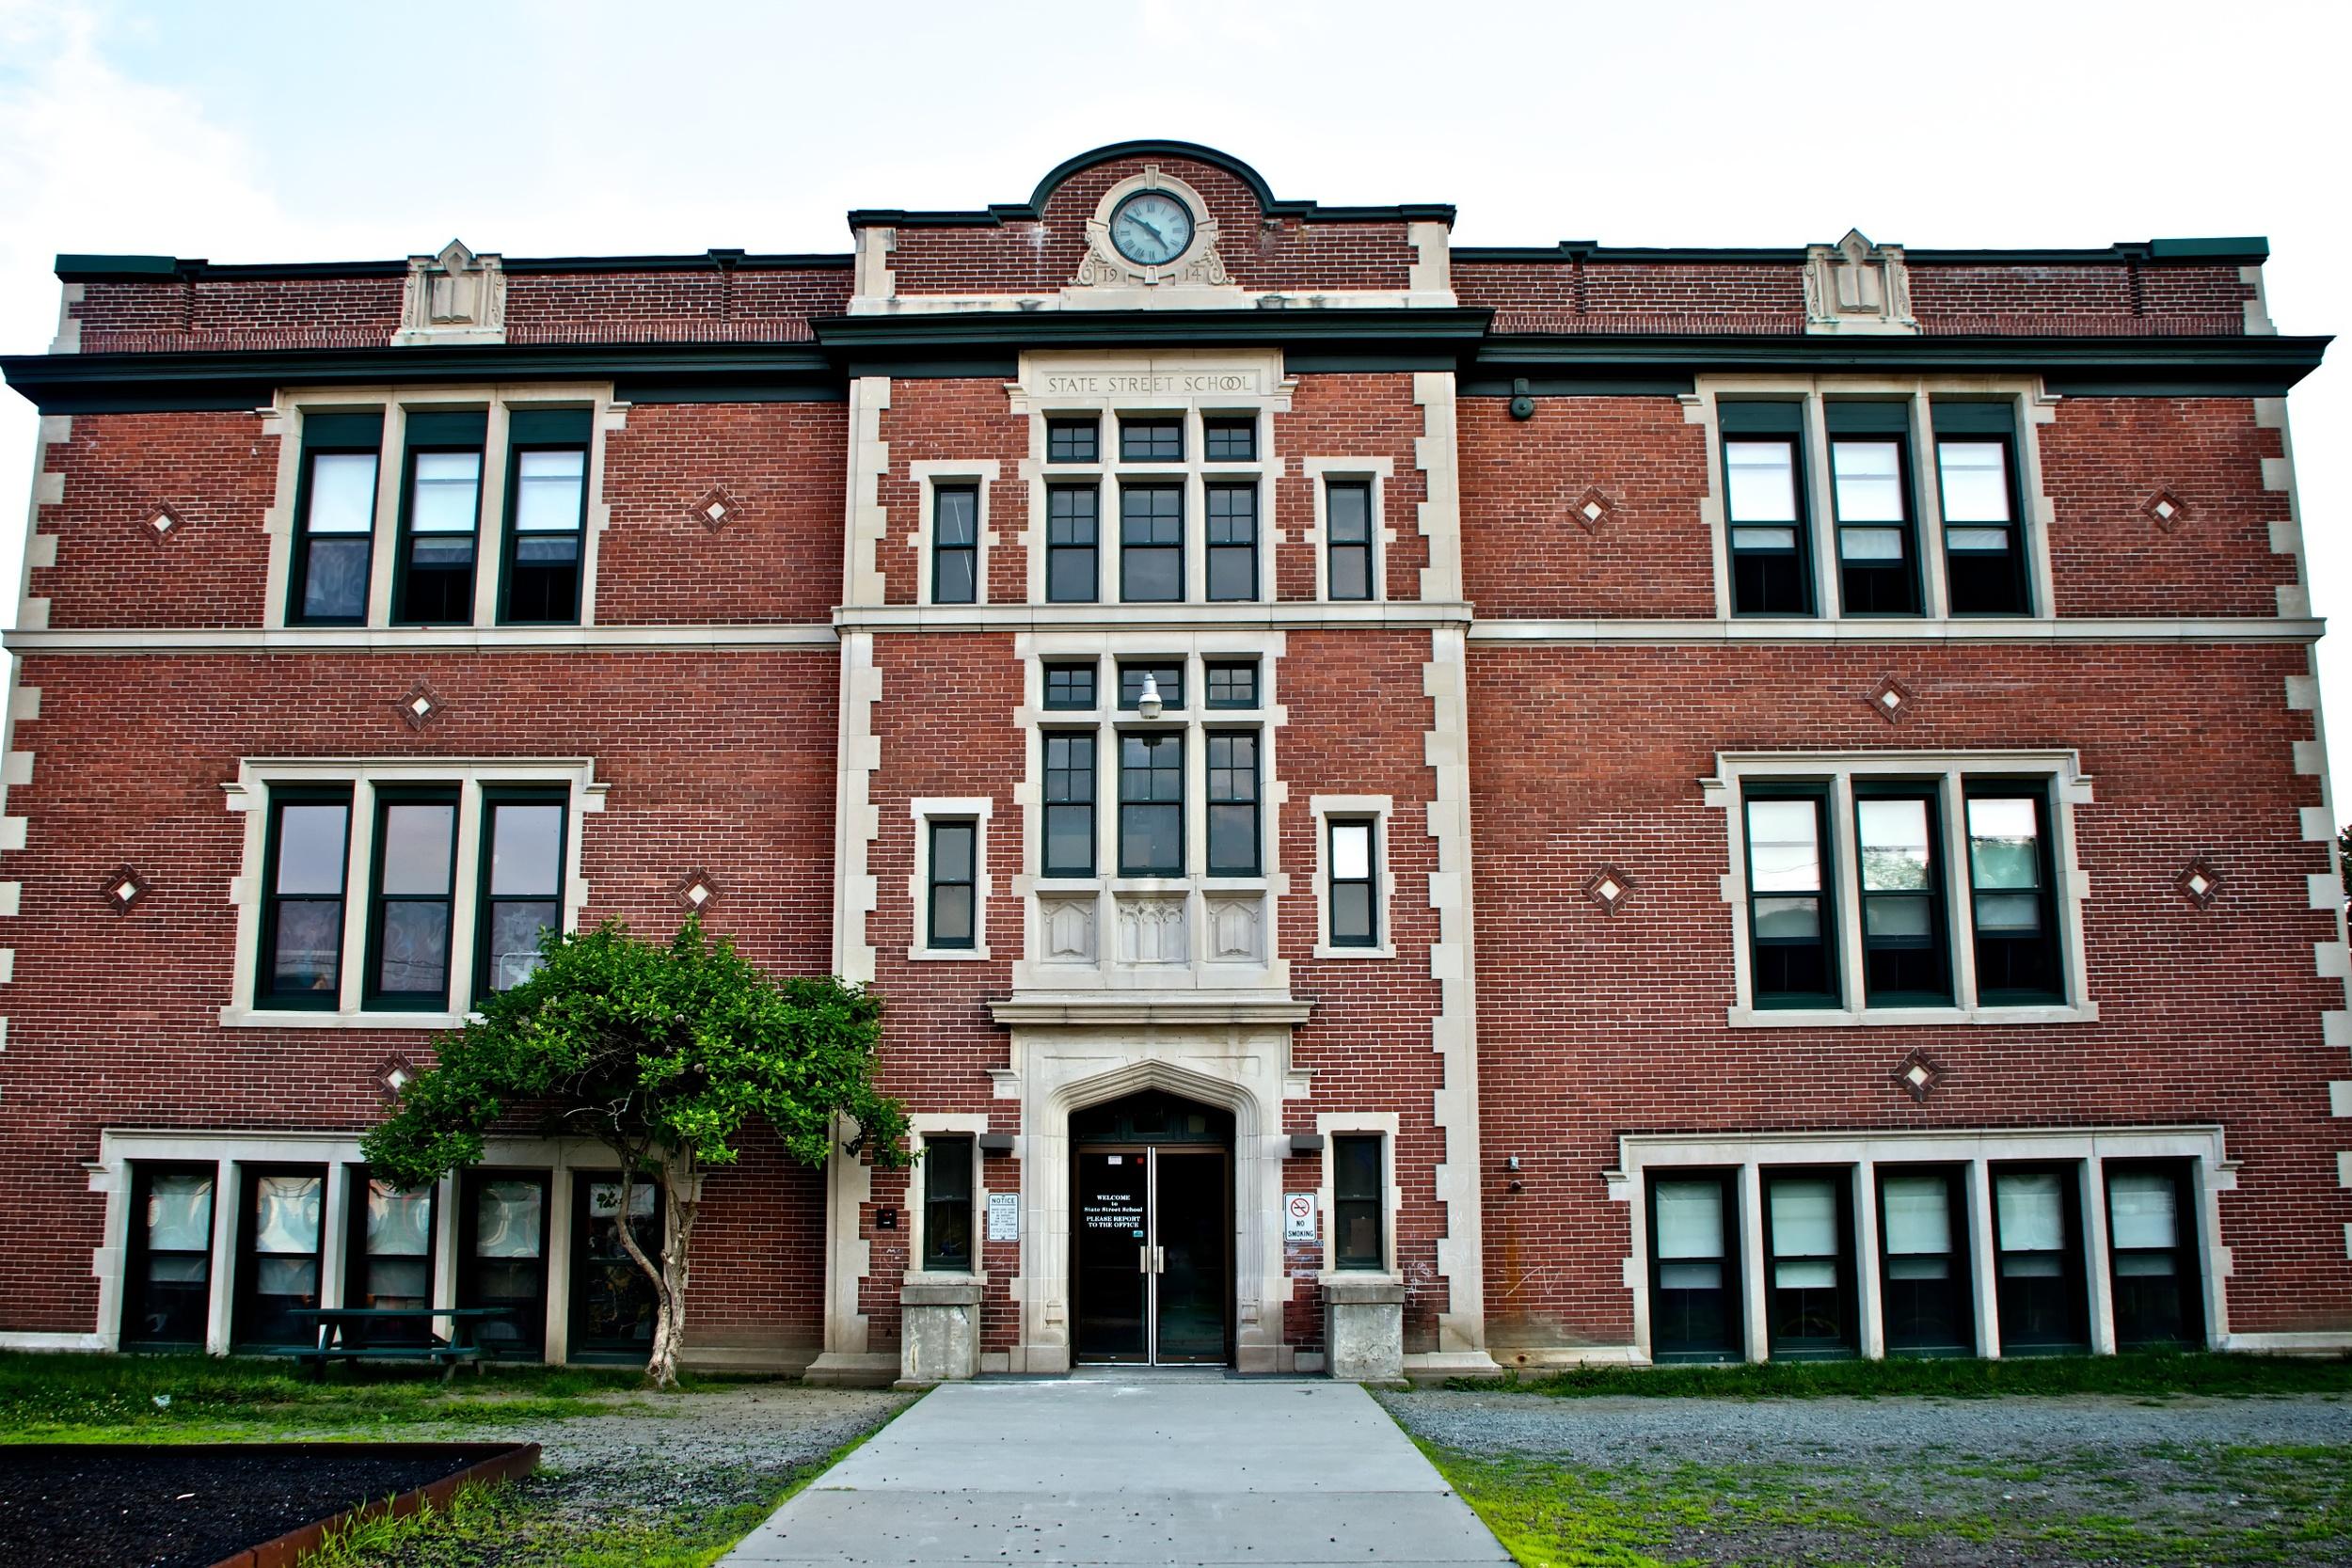 State Street School.jpg